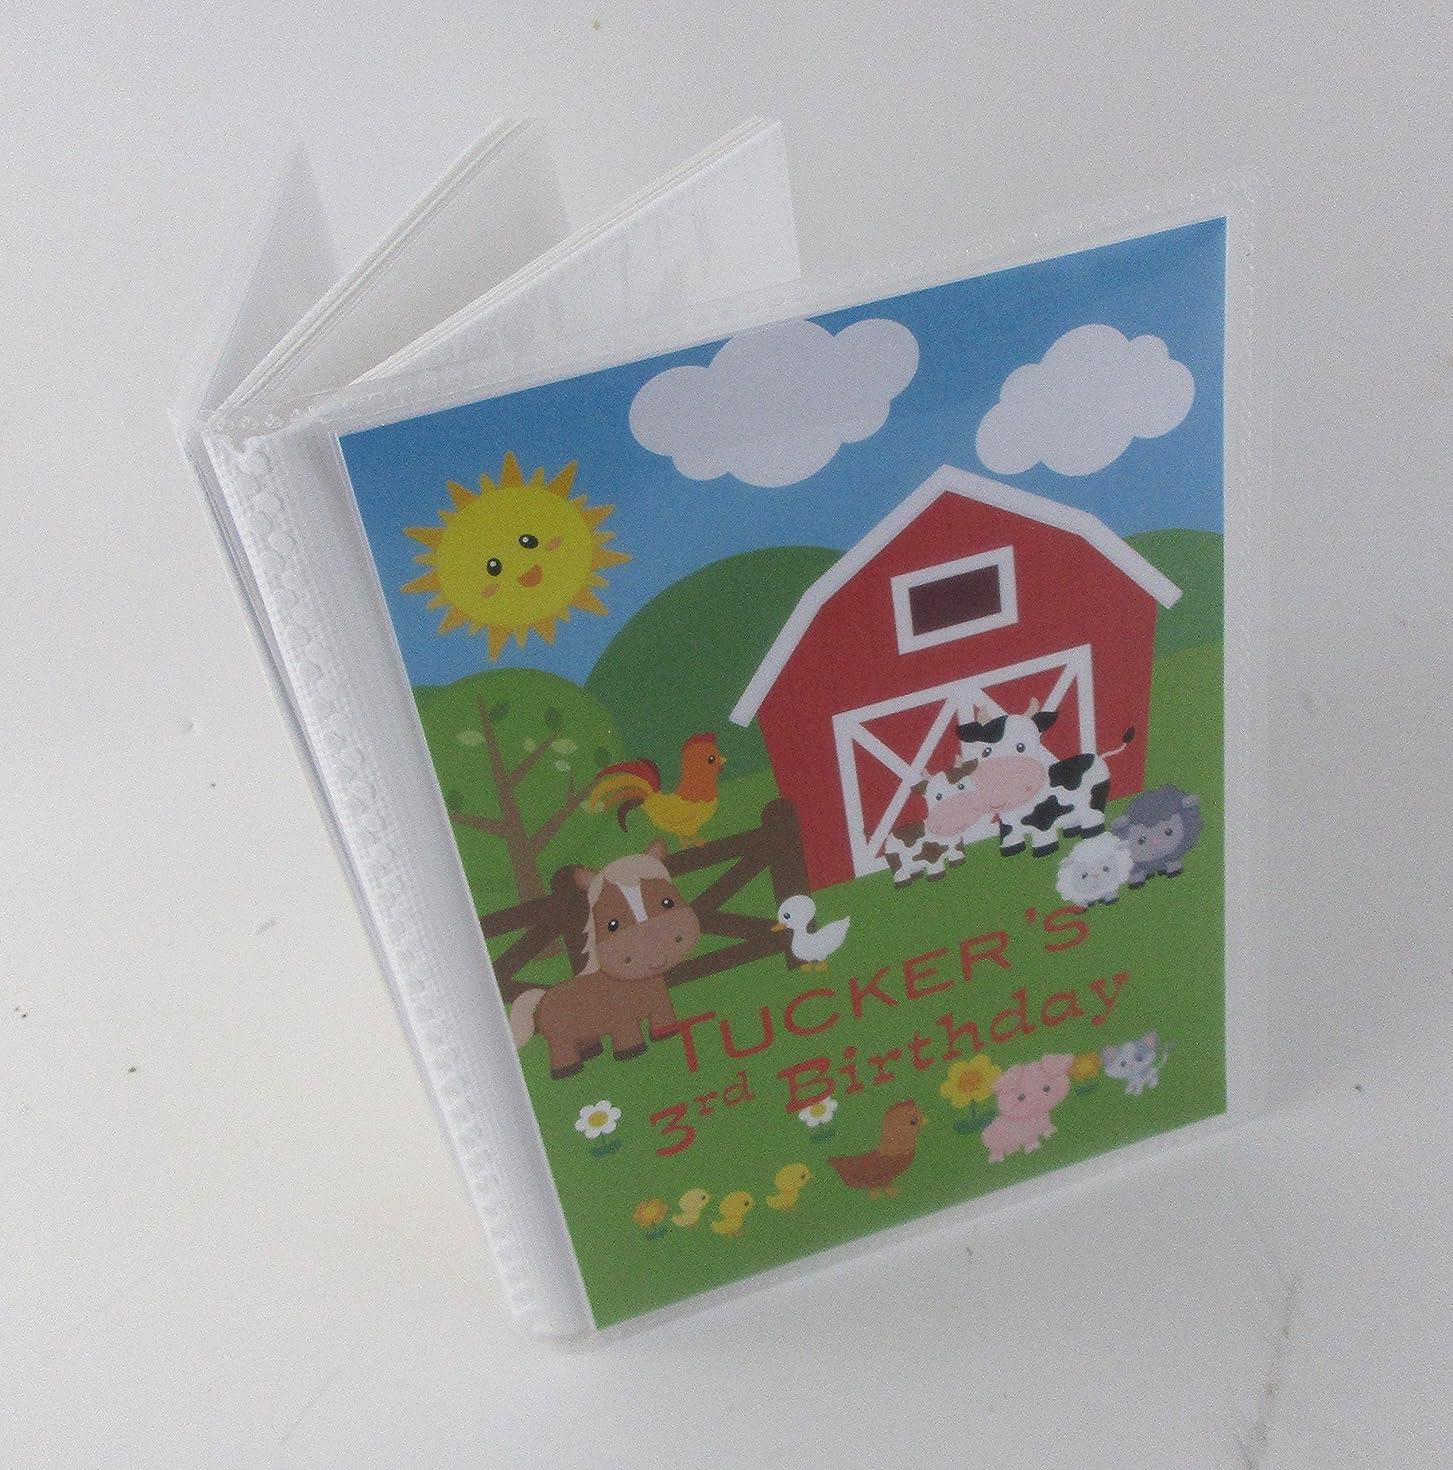 Birthday Photo Album IA#541 Barnyard Farm Animals Personalized Baby Boy or Girl 4x6 or 5x7 Pictures